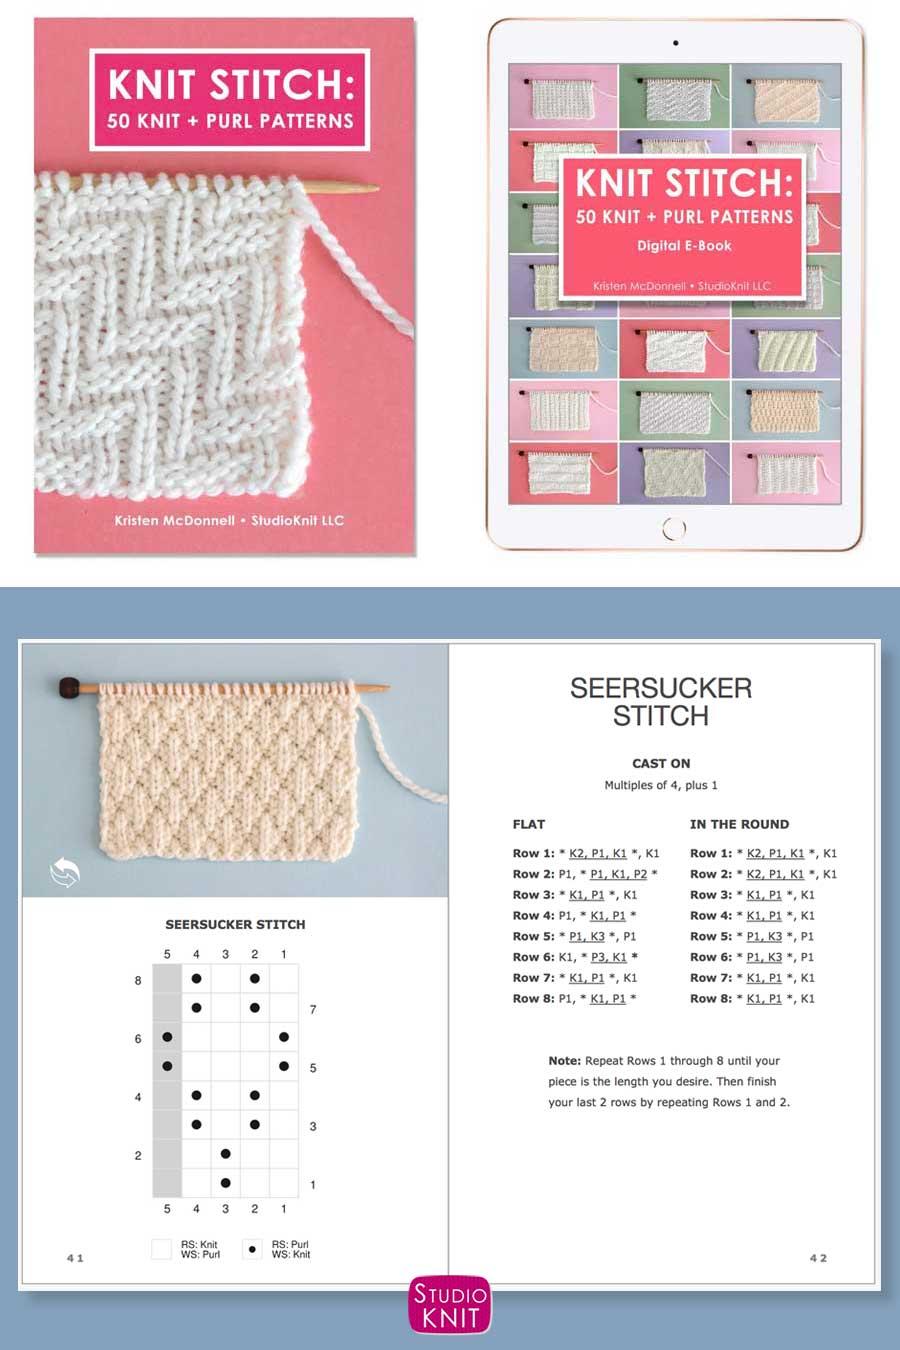 Knit Stitch Pattern Book with Seersucker Stitch Pattern by Studio Knit